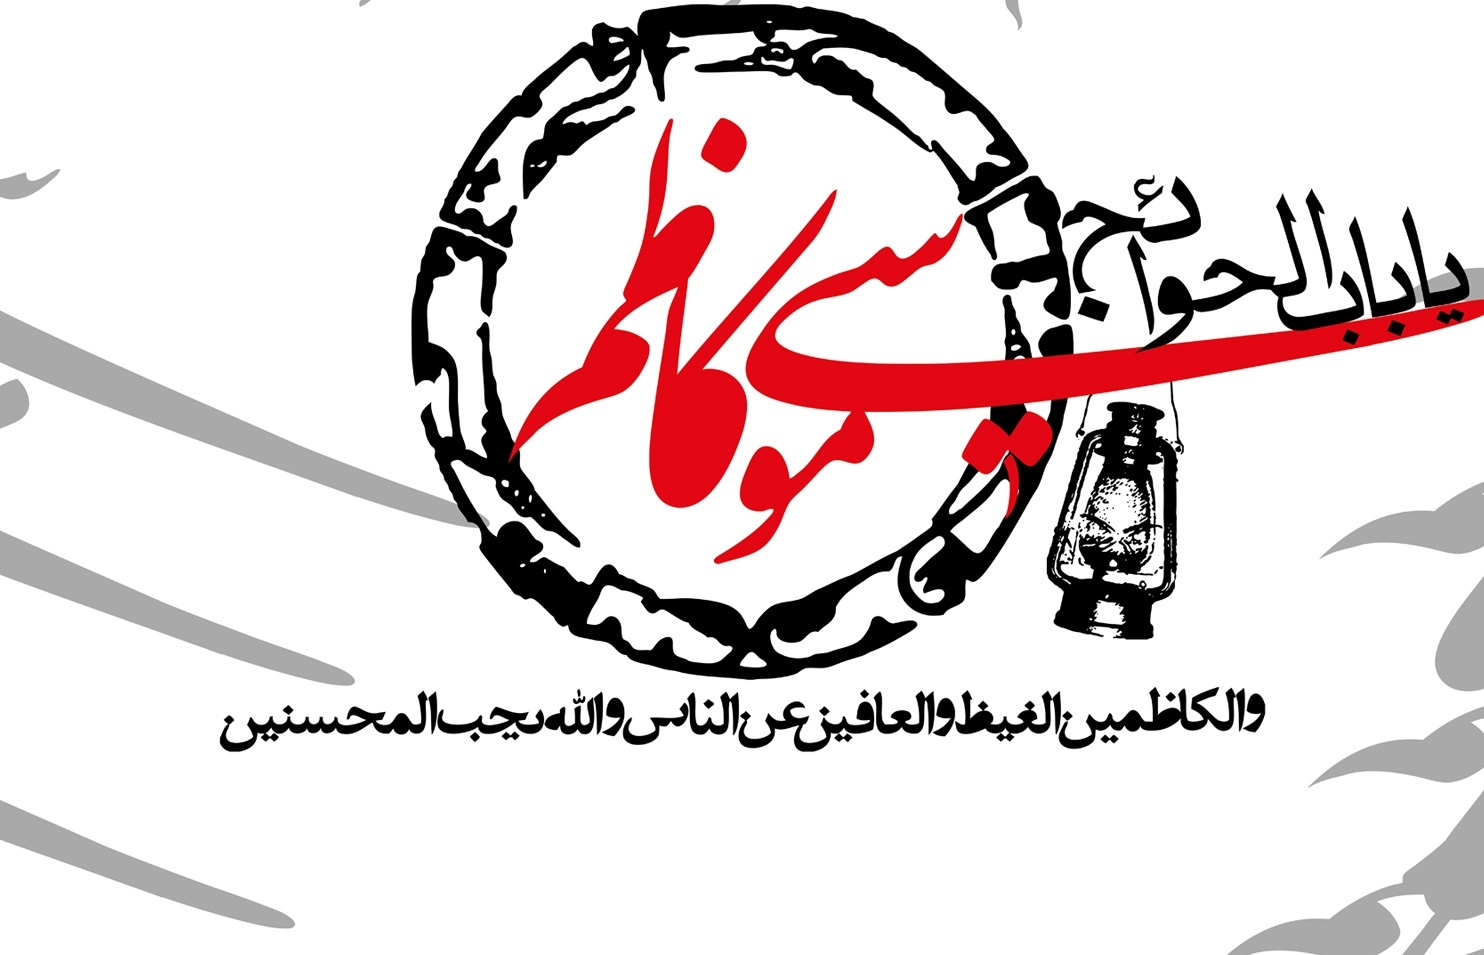 دانلود مداحی شهادت امام کاظم علیه السلام/ جواد مقدم